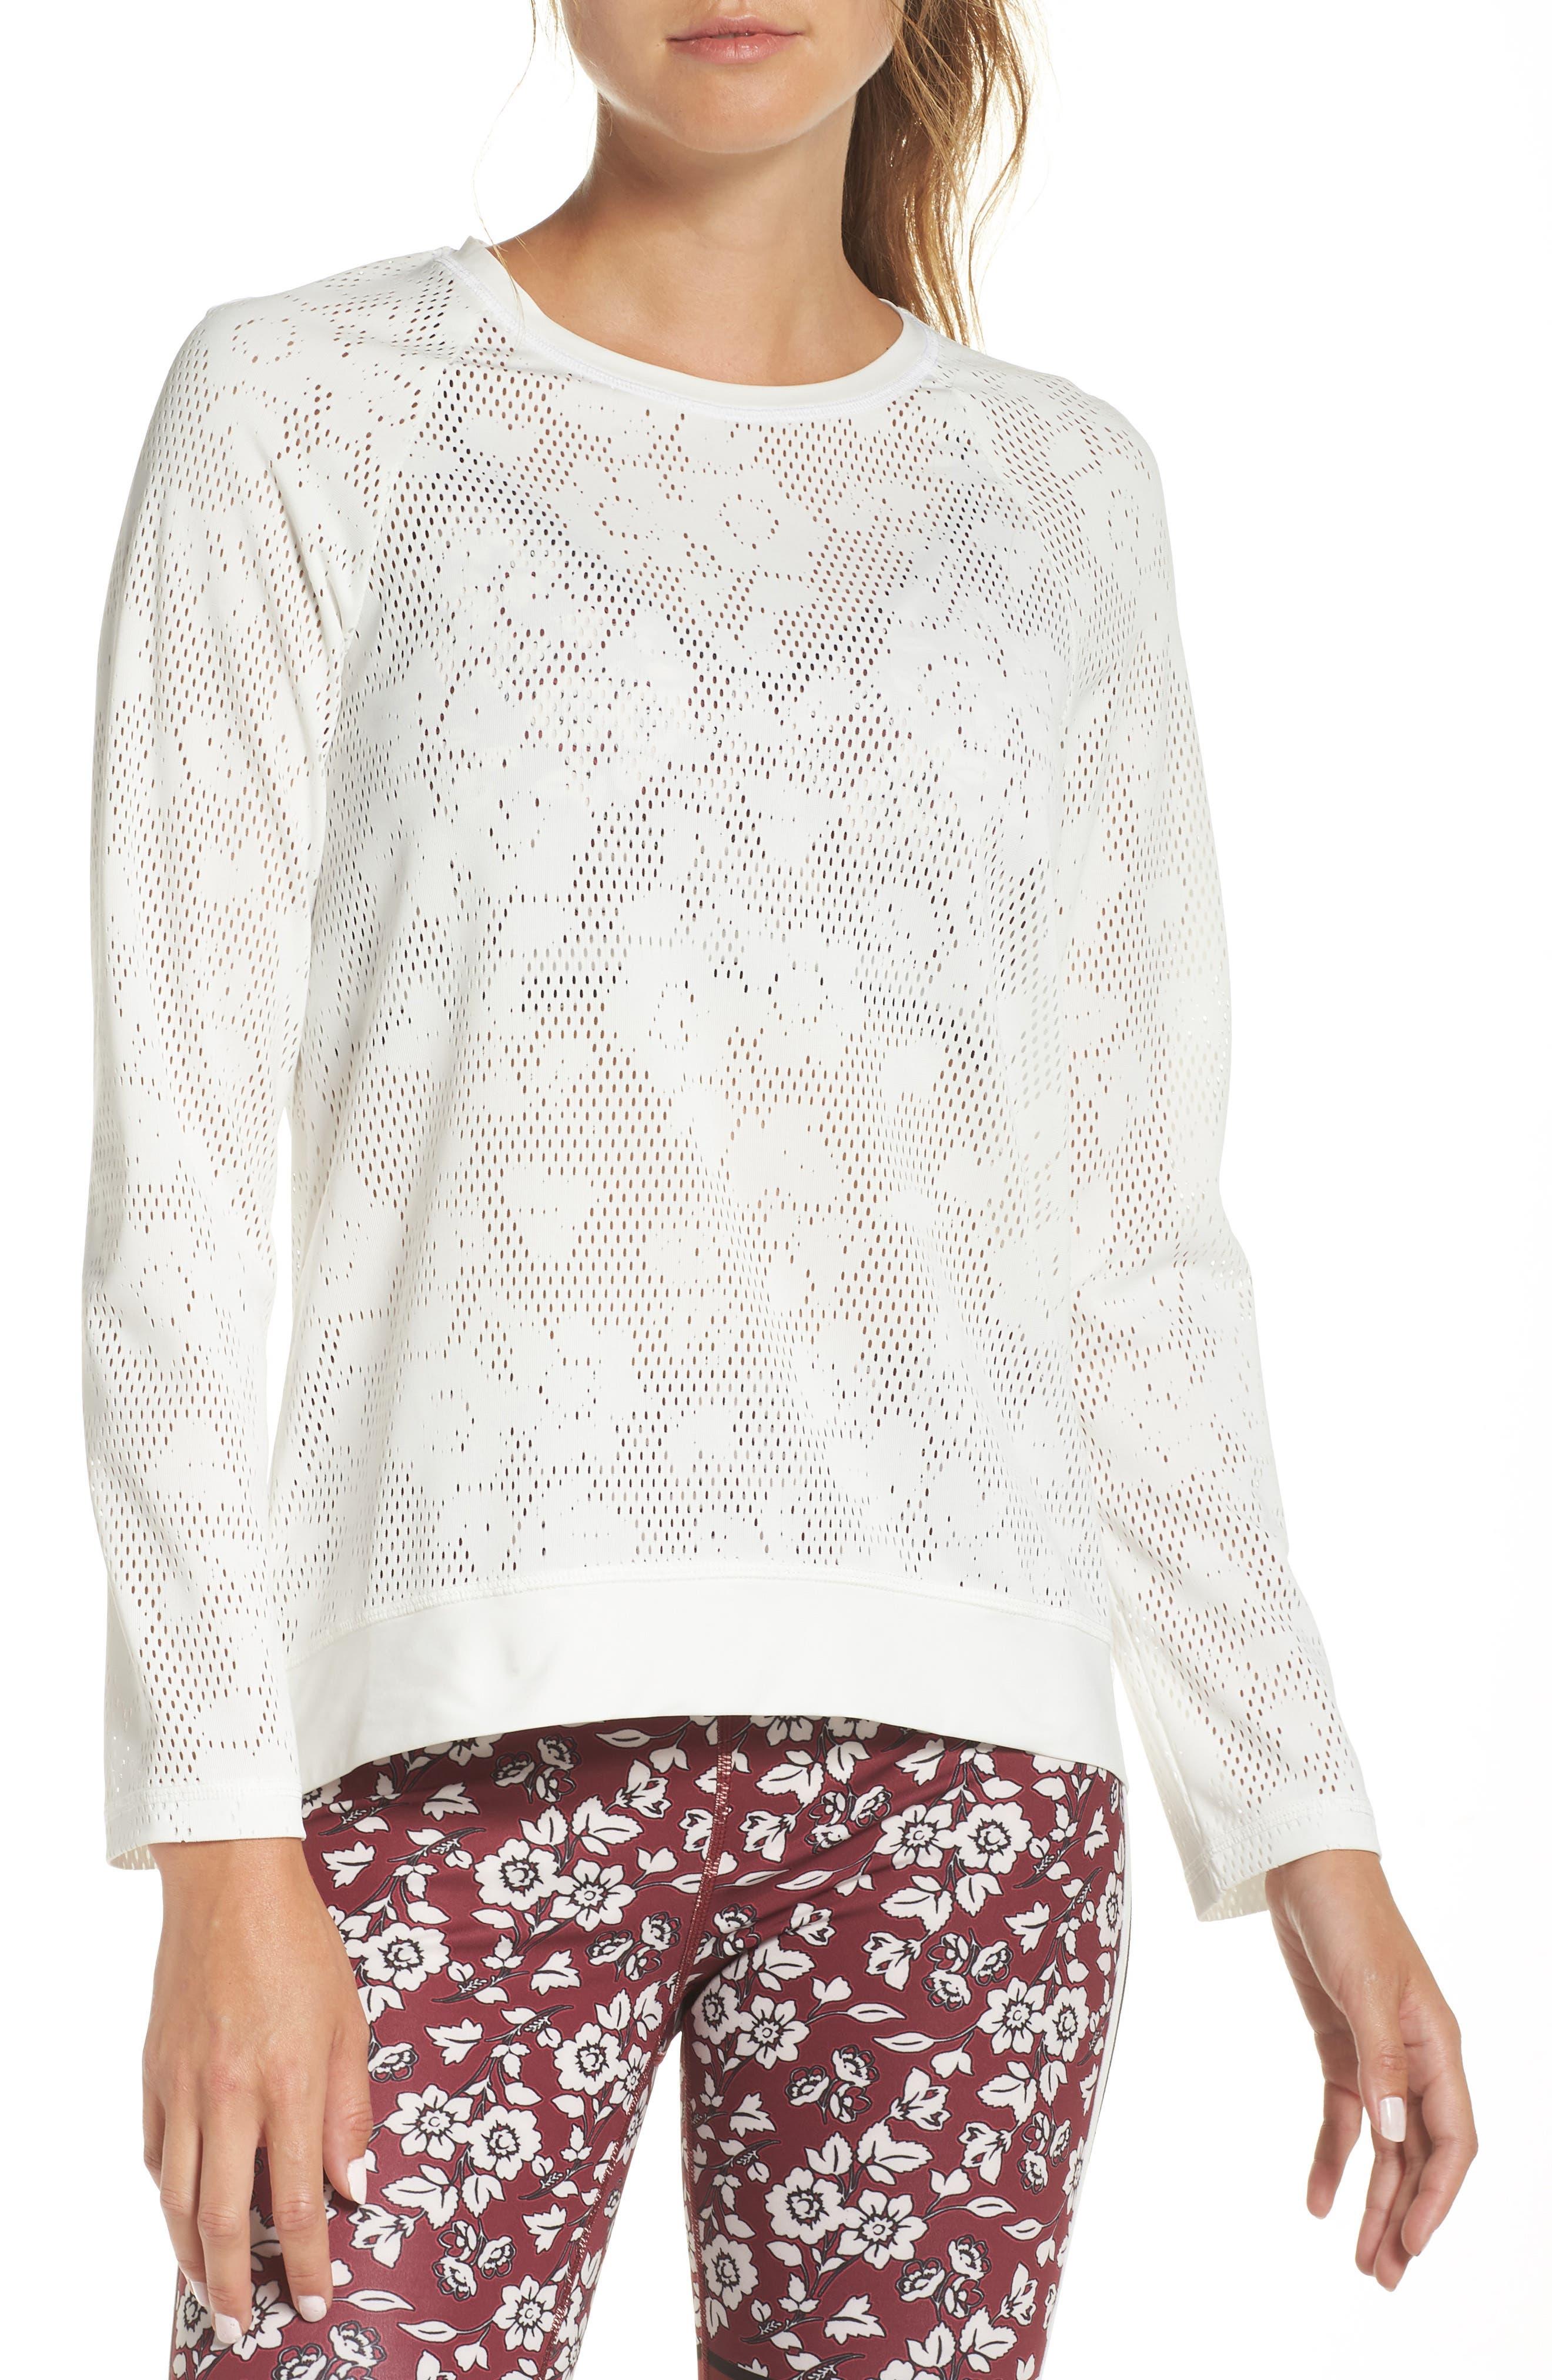 floral mesh top,                         Main,                         color, CREAM